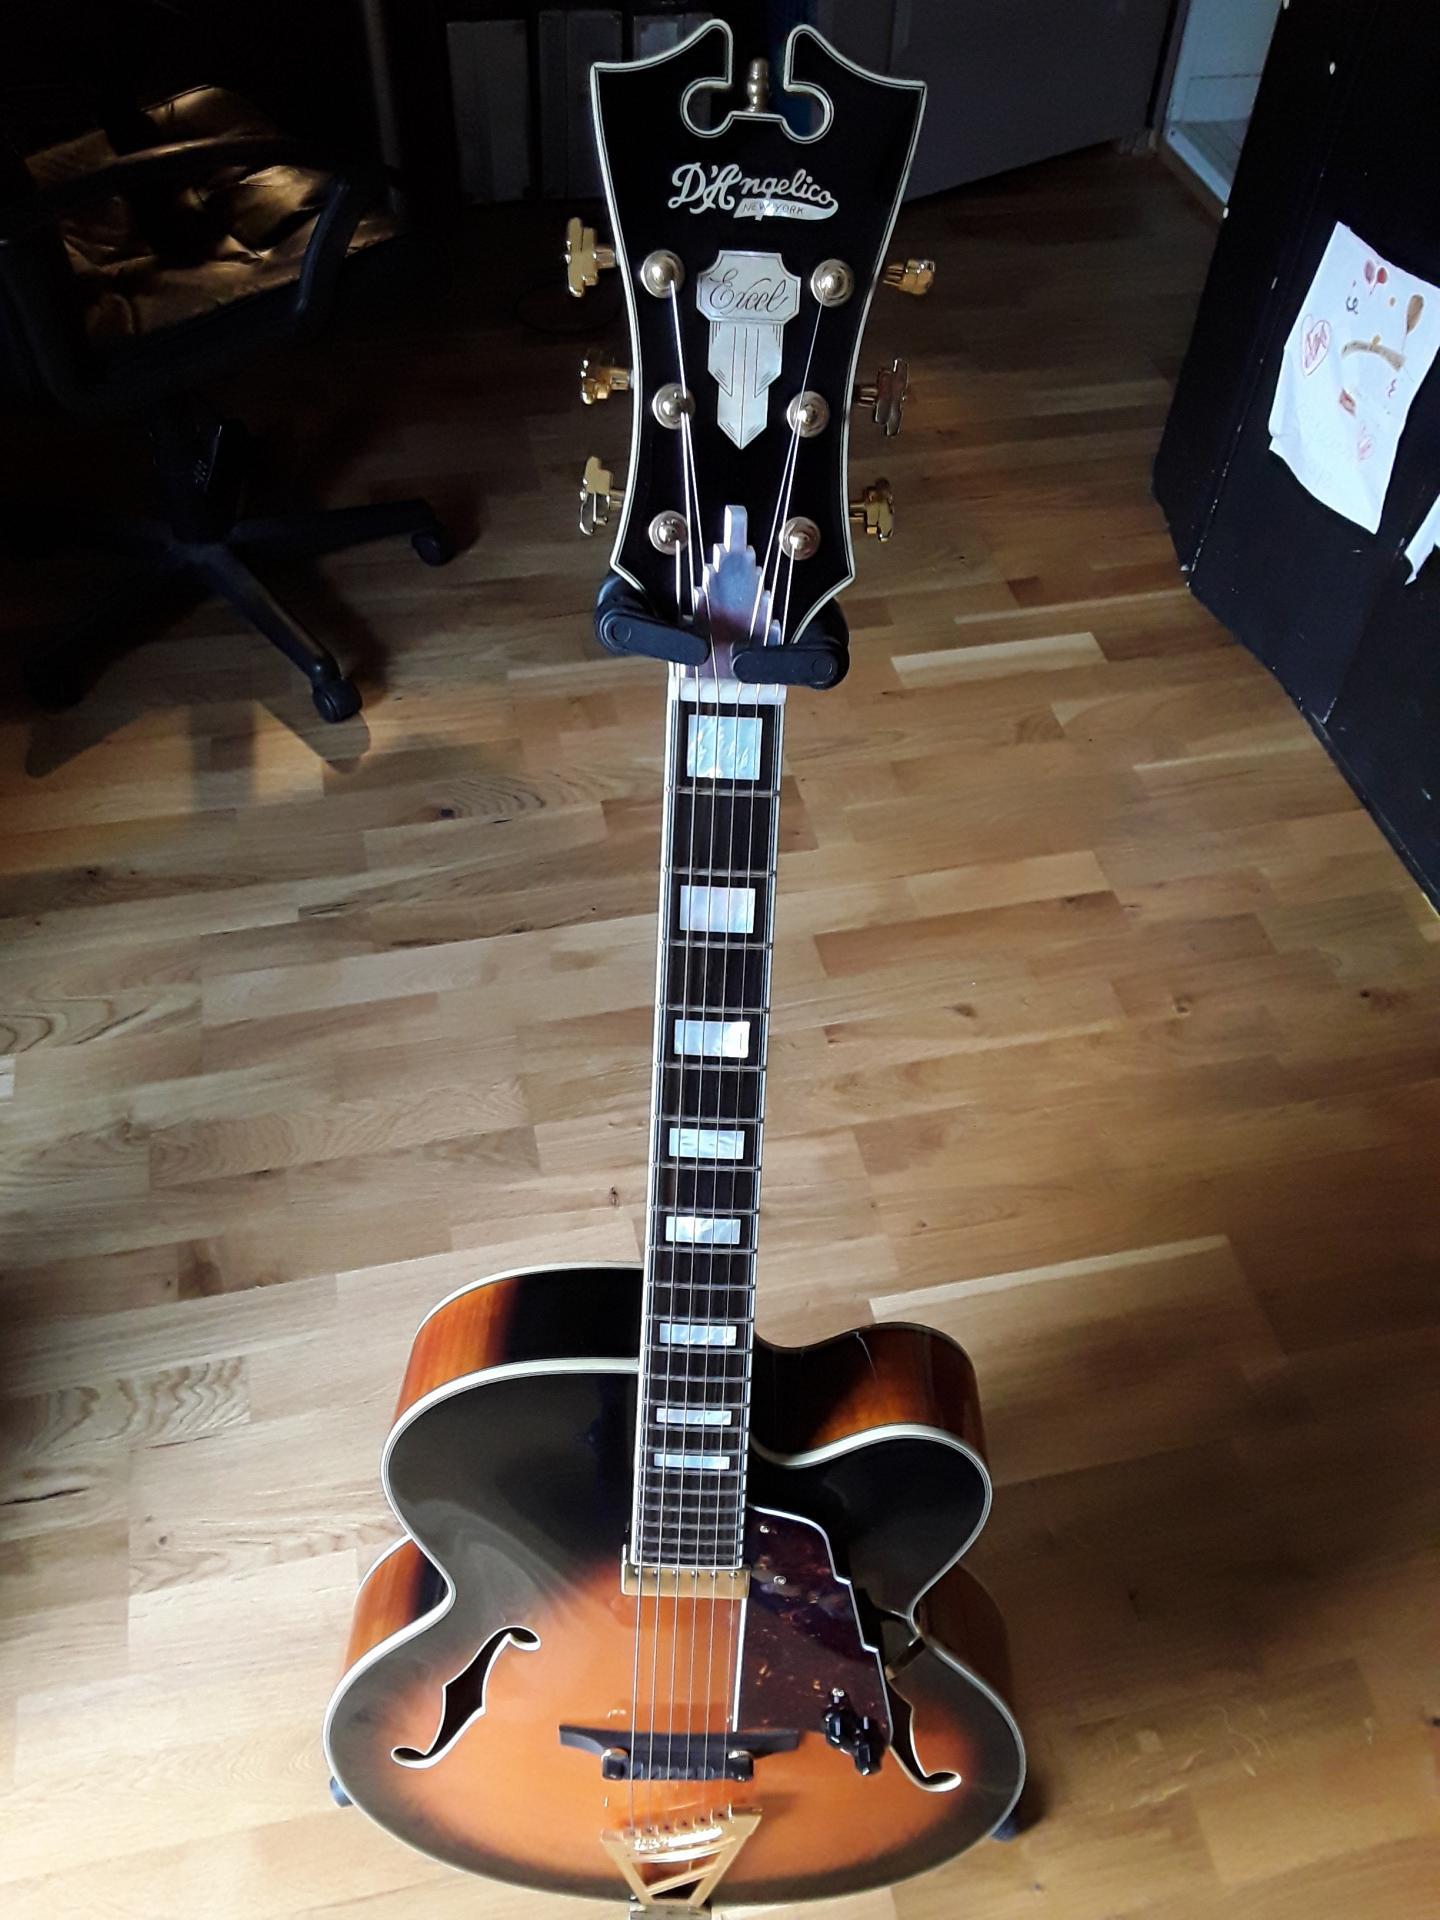 D'angelico EXL1 - Archtop jazz guitar